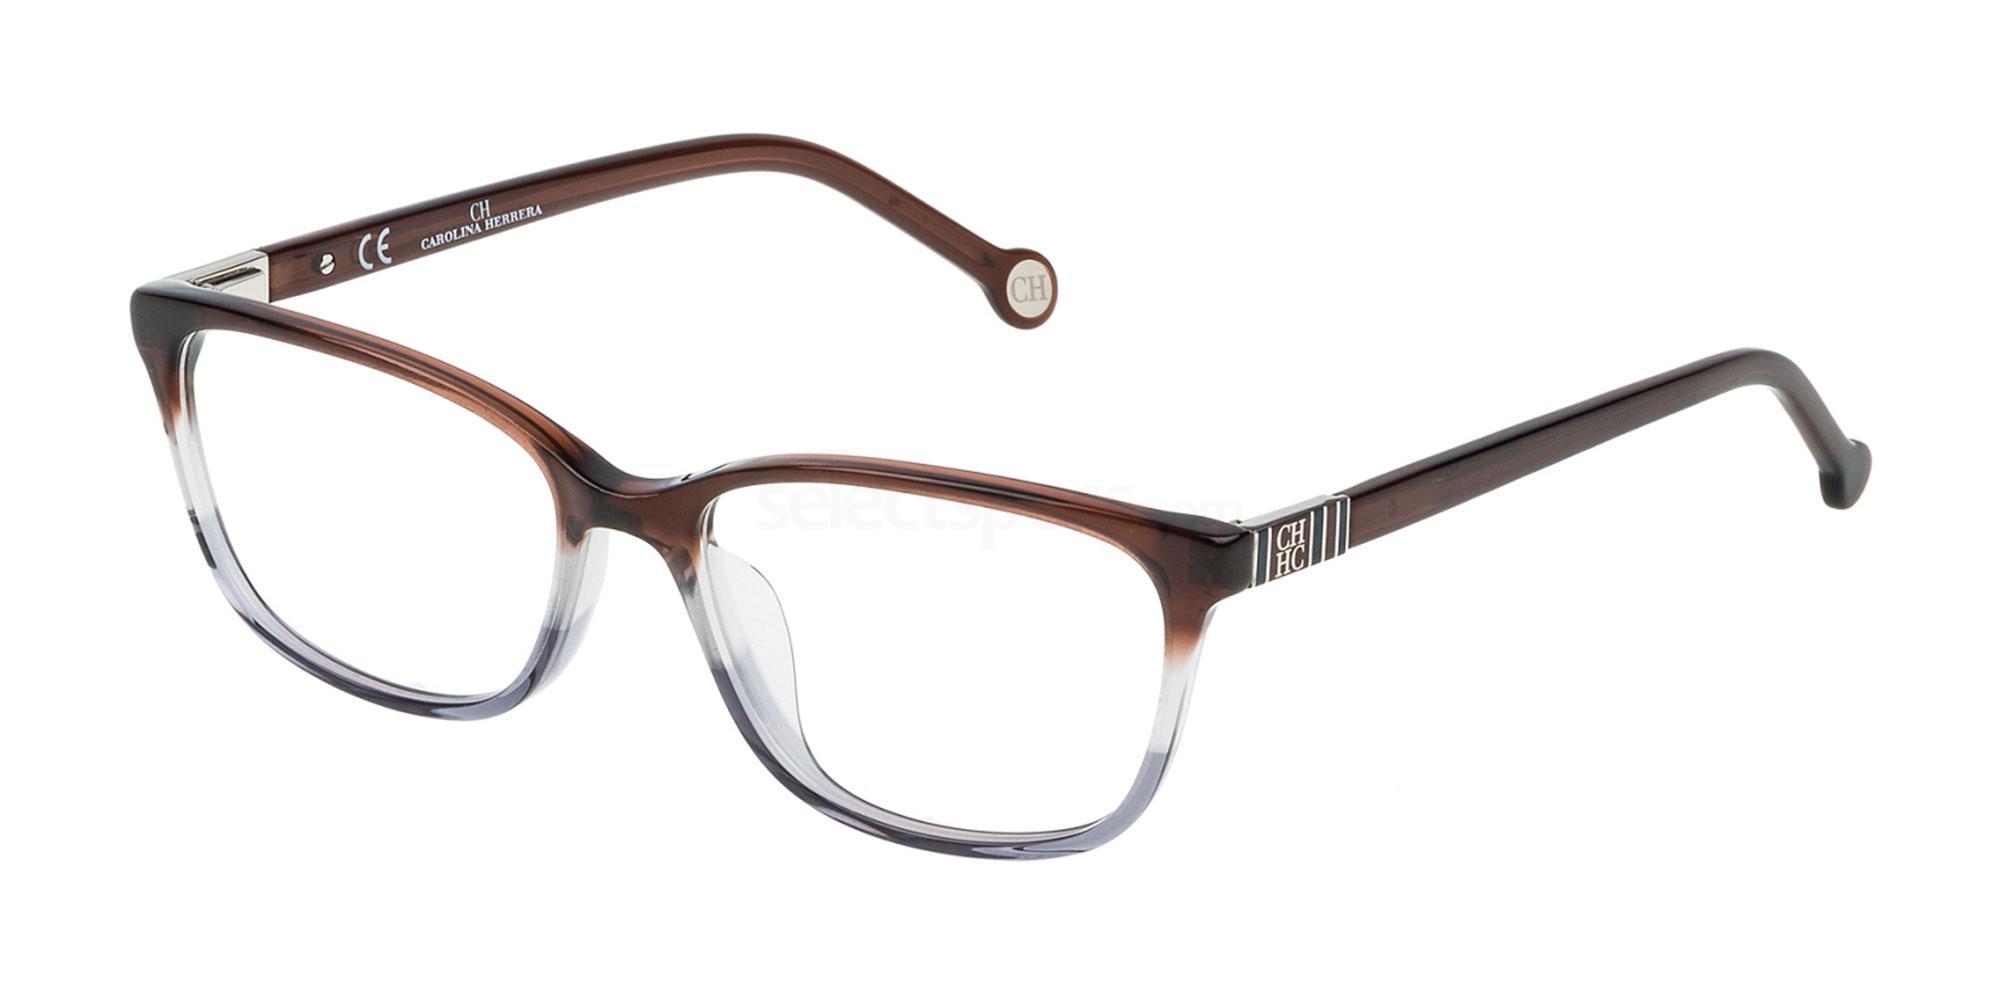 0918 VHE633 Glasses, CH Carolina Herrera